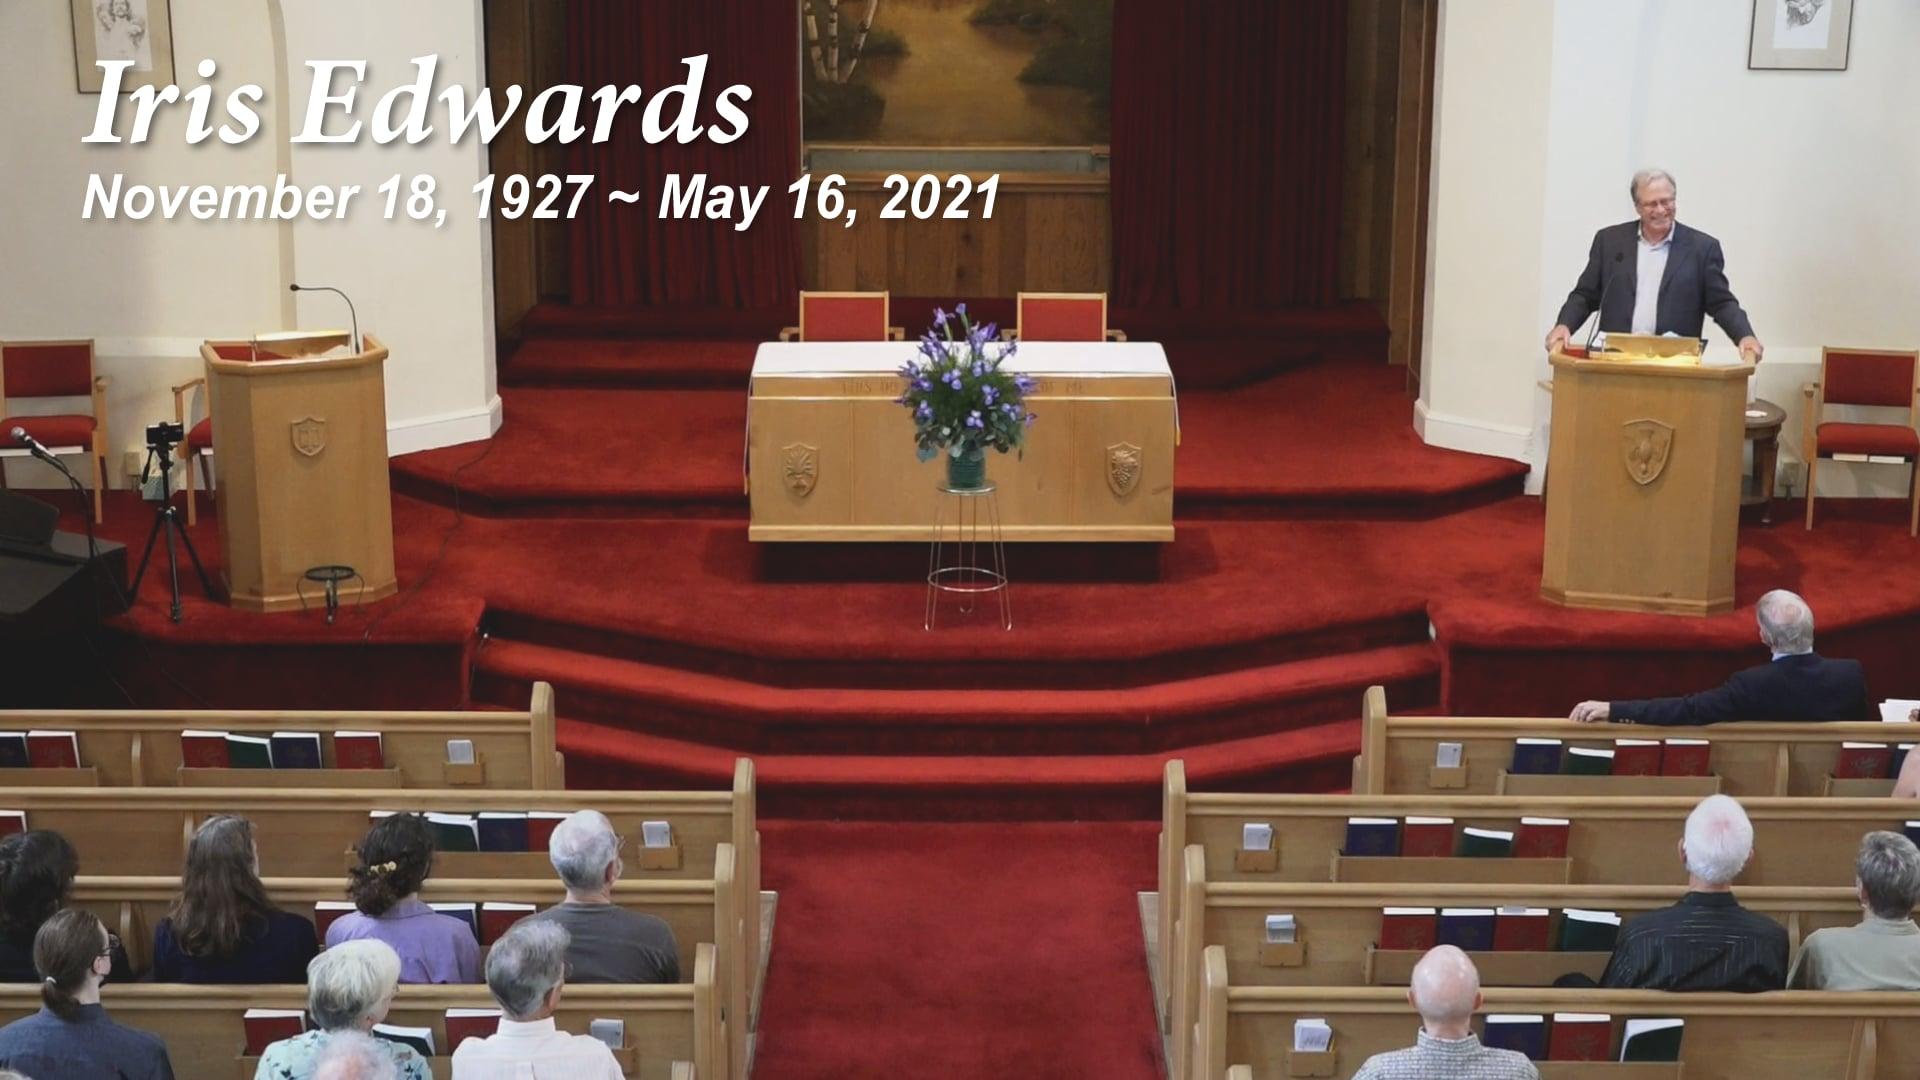 Memorial Service for Iris Edwards